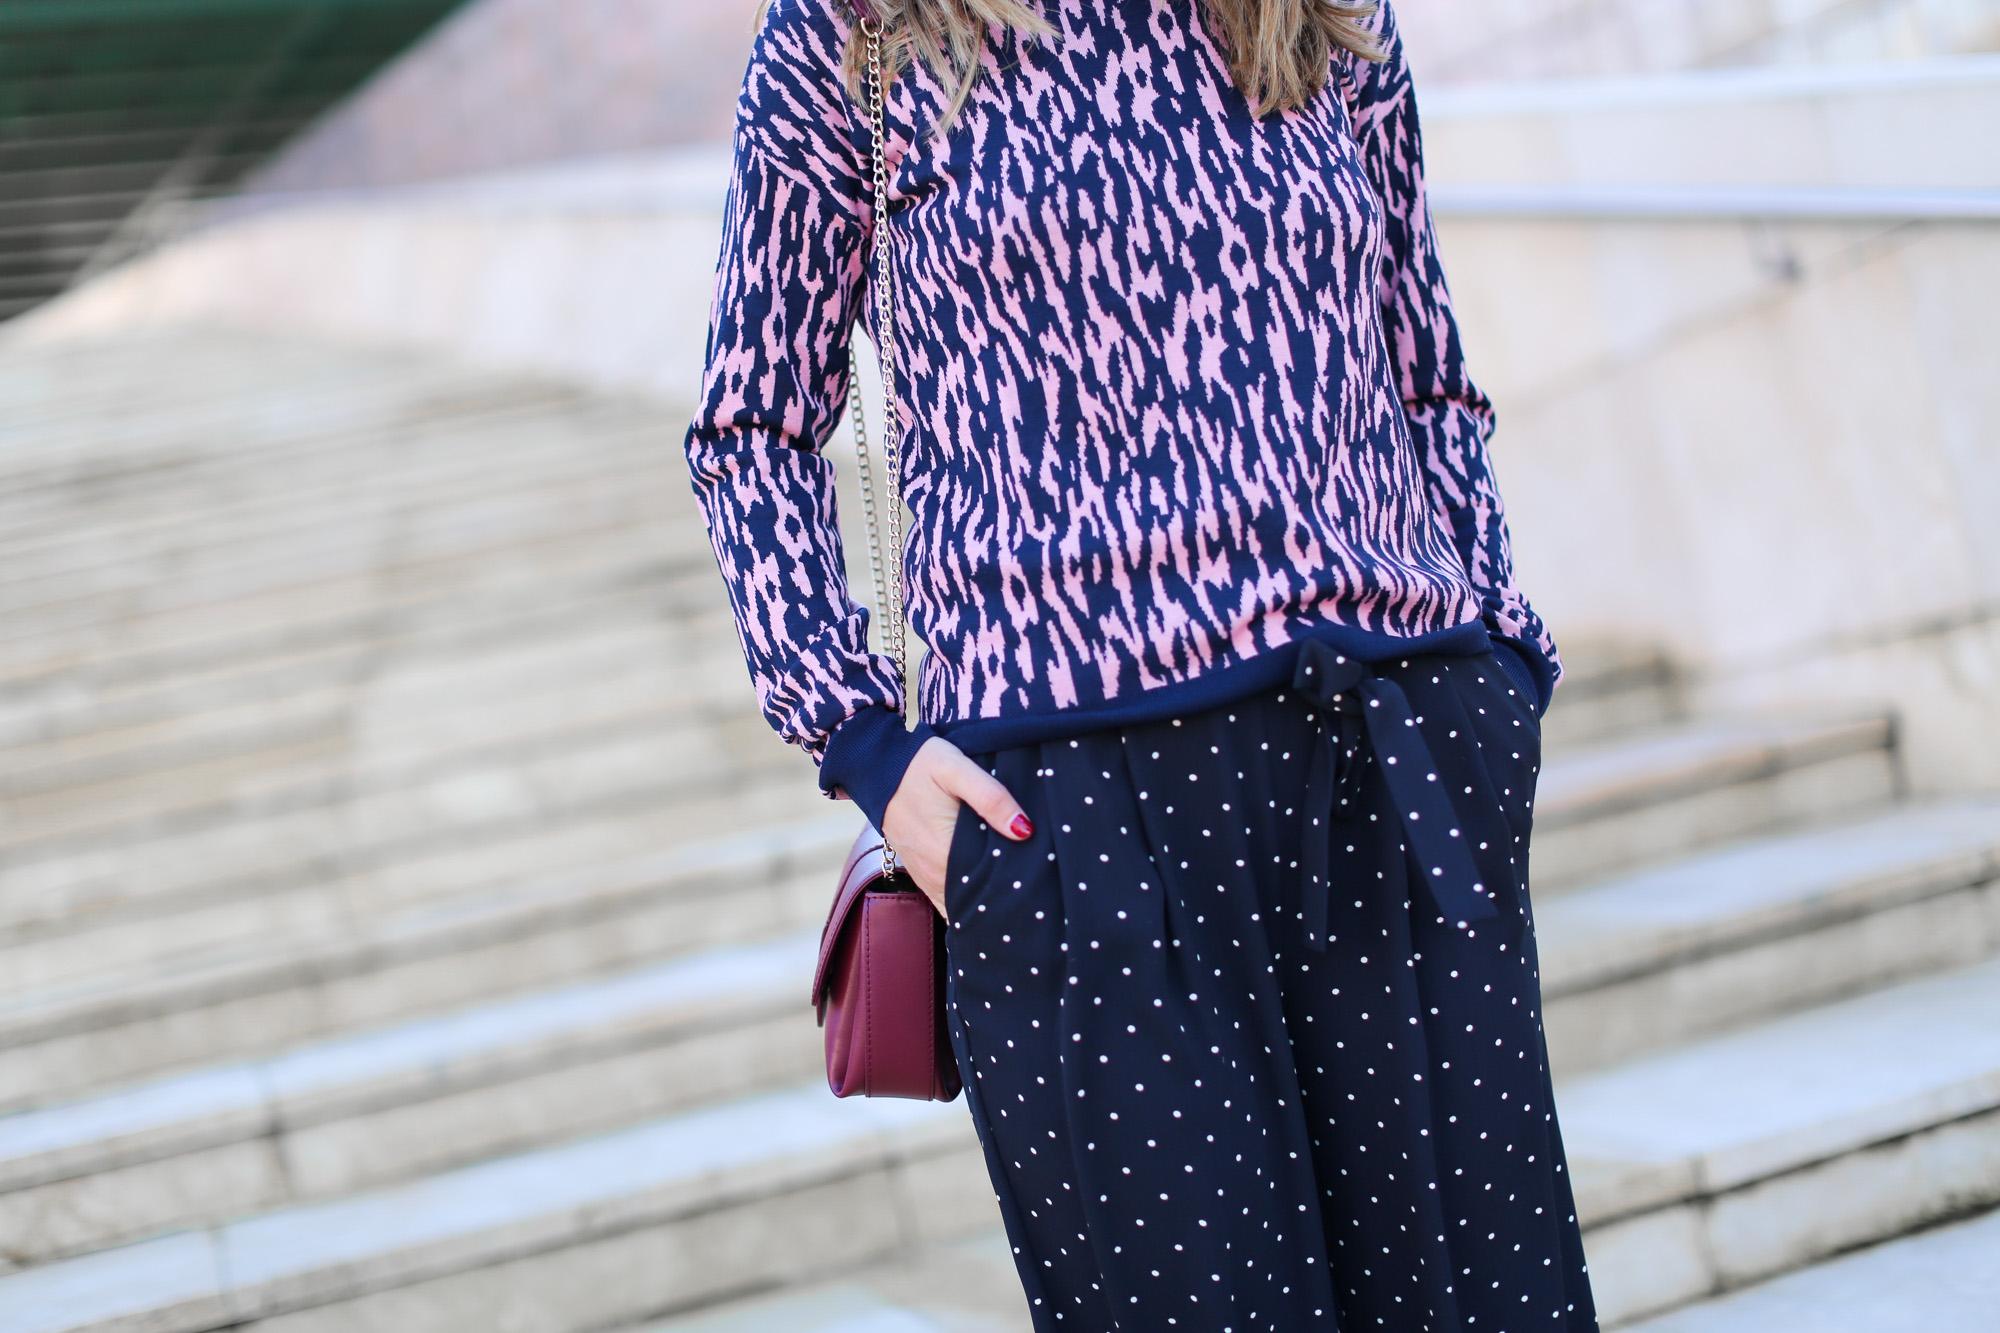 Clochet_streetstyle_fashionblogger_andotherstories_merinowooljacquardsweater_leopardprintpinkandblue_adidasstansmith-6